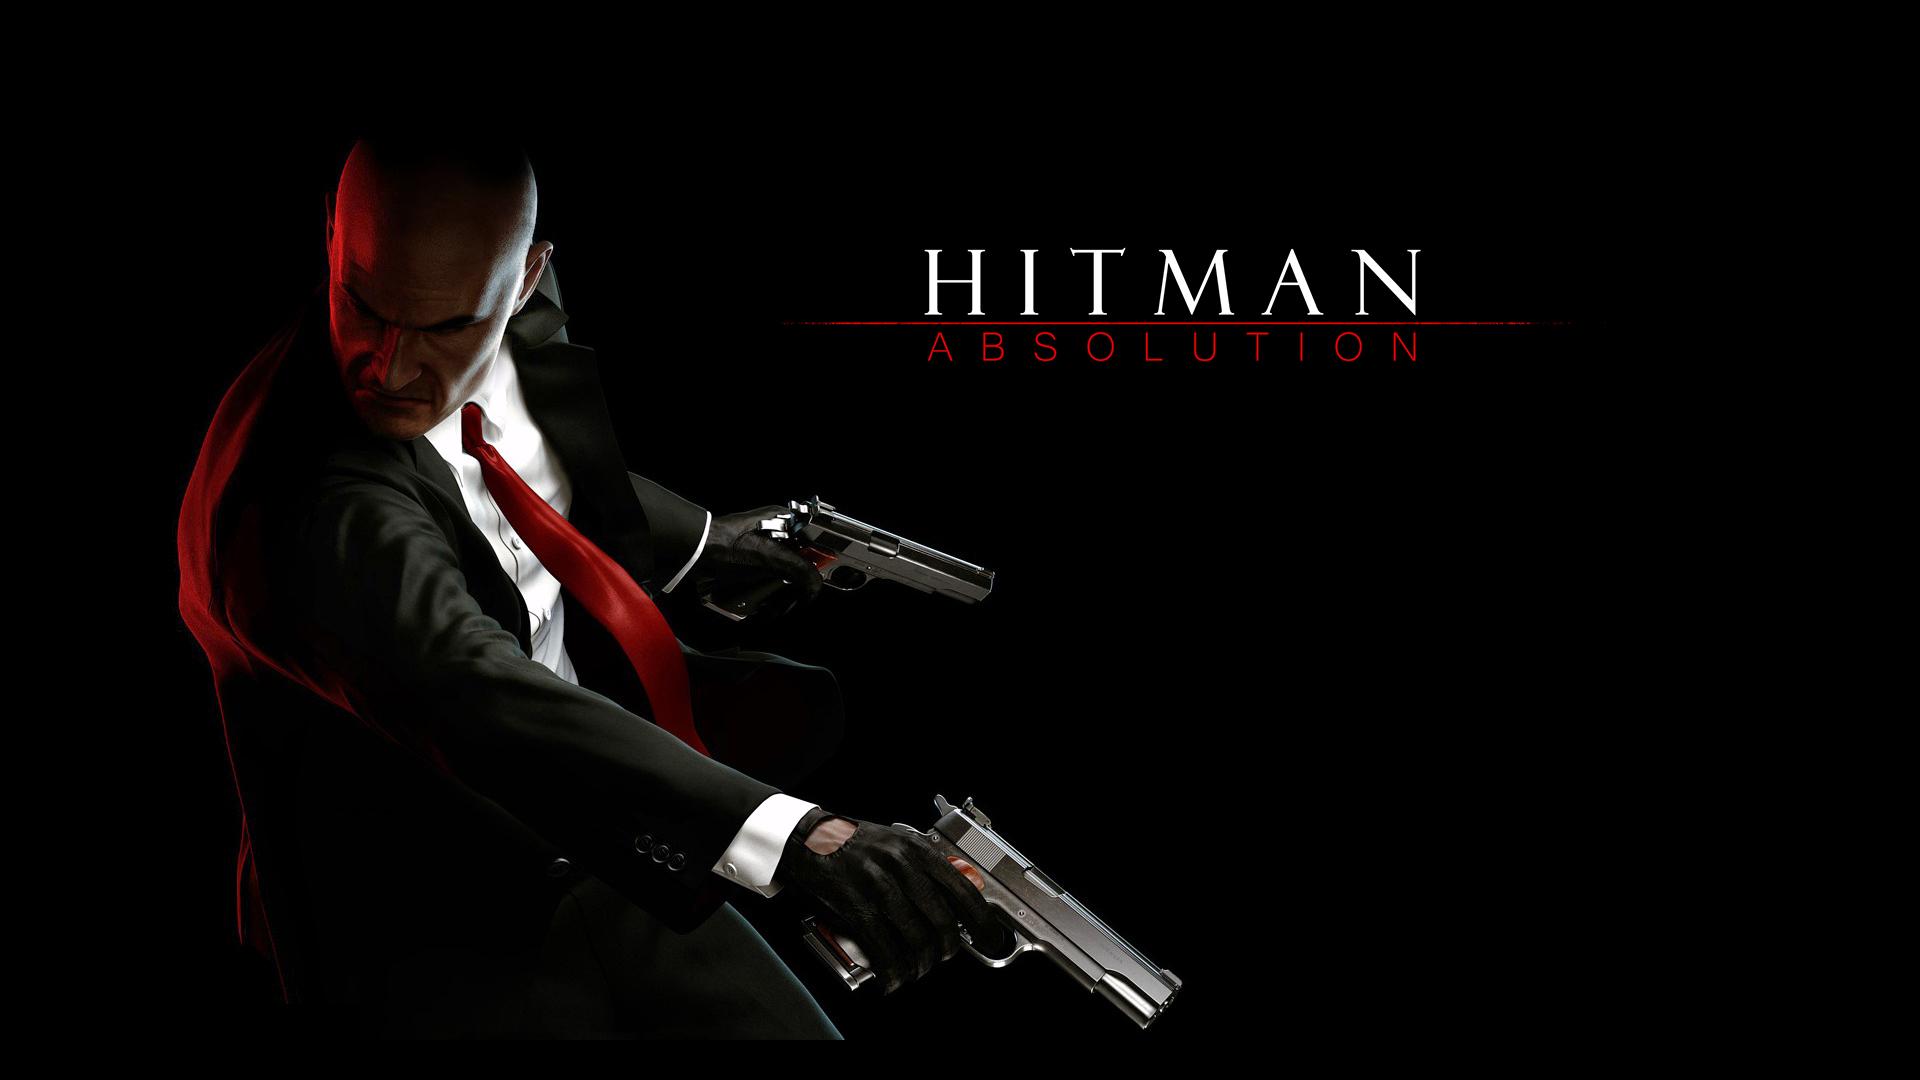 hitman absolution wallpaper 4k